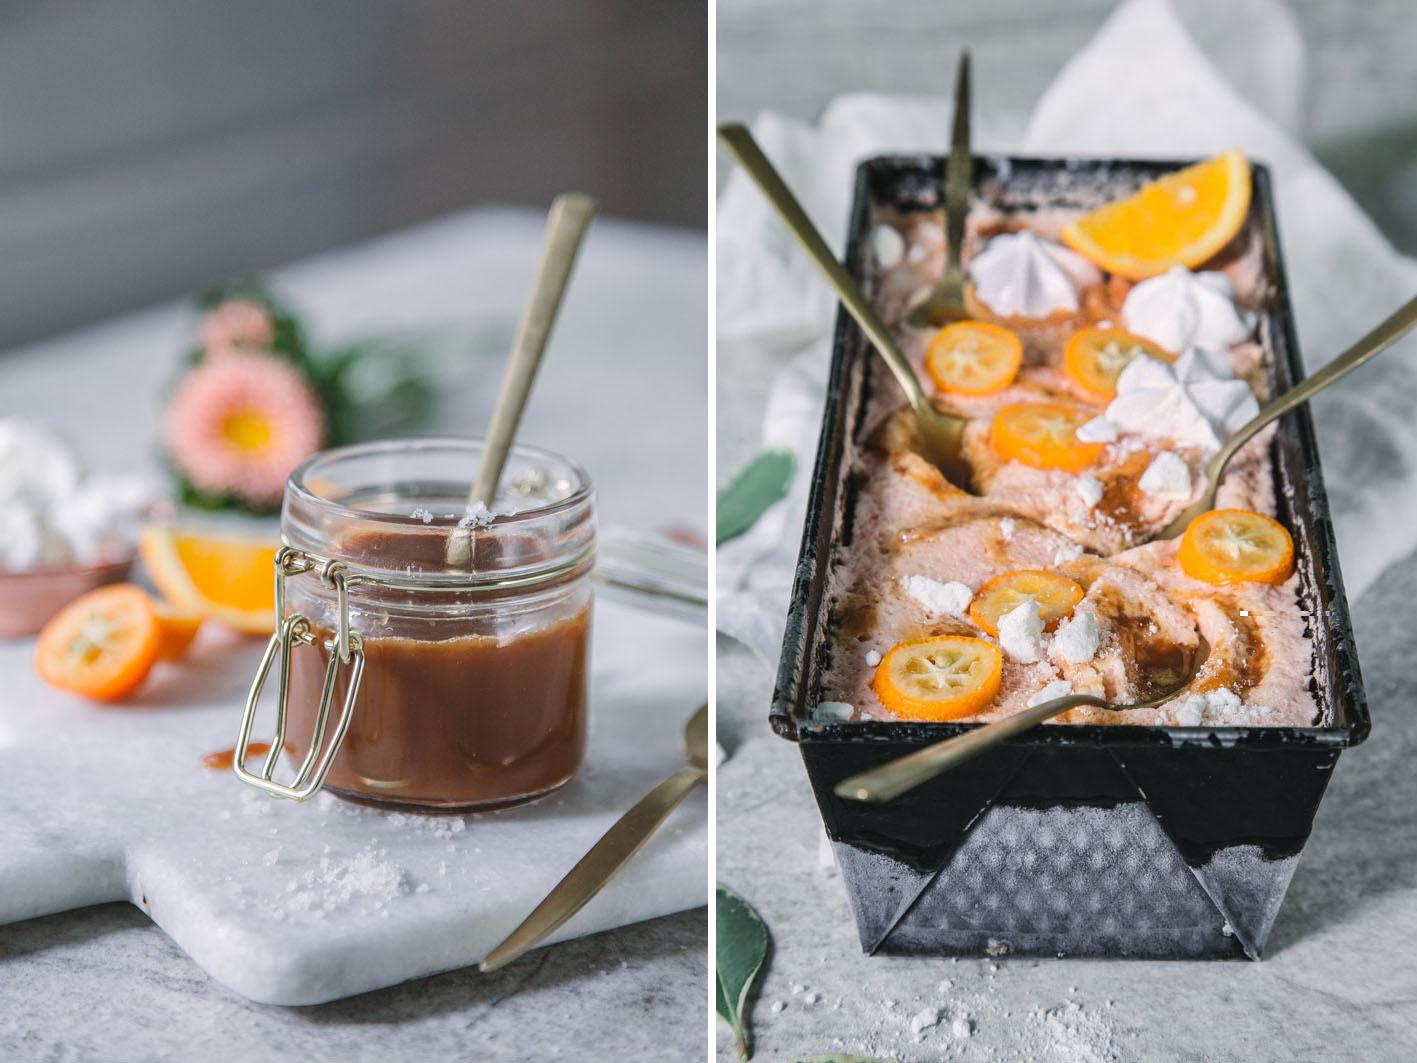 Orangensorbet mit gesalzenem Karamell